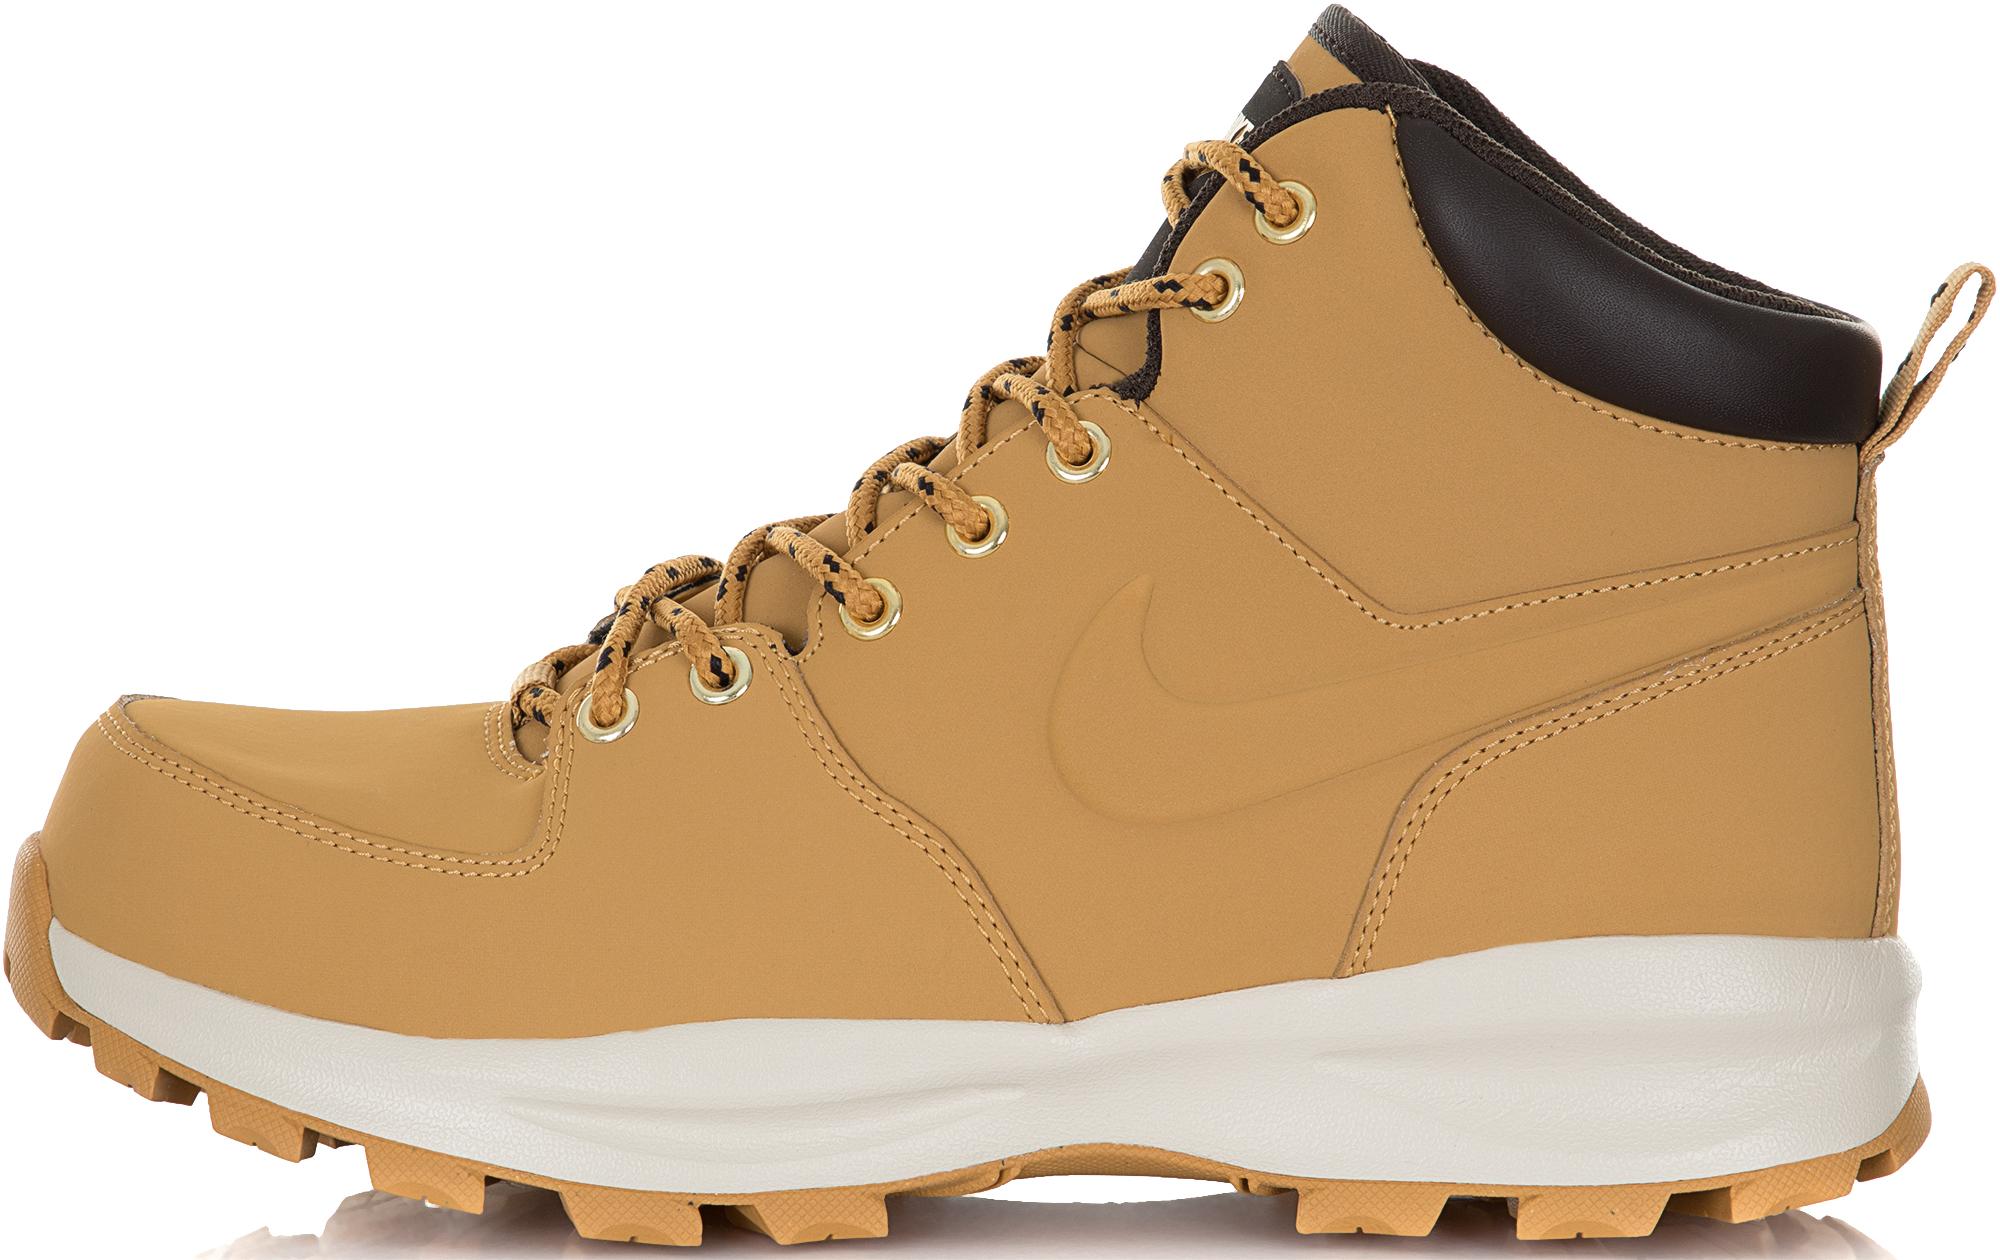 цена Nike Кроссовки утепленные мужские Nike Manoa Leather, размер 41 онлайн в 2017 году